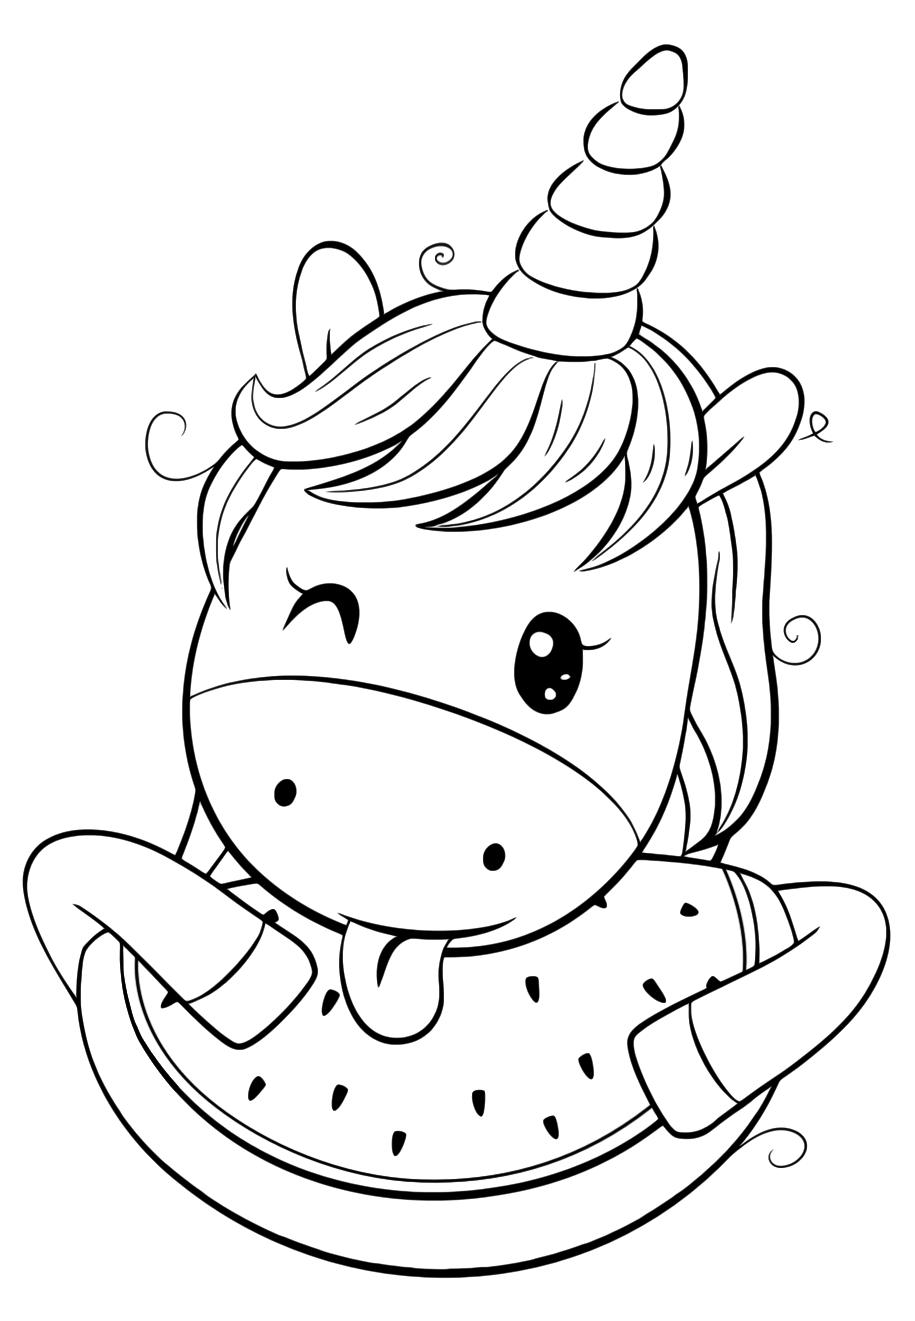 Милашка Единорог с арбузом - Милашки - Раскраски антистресс